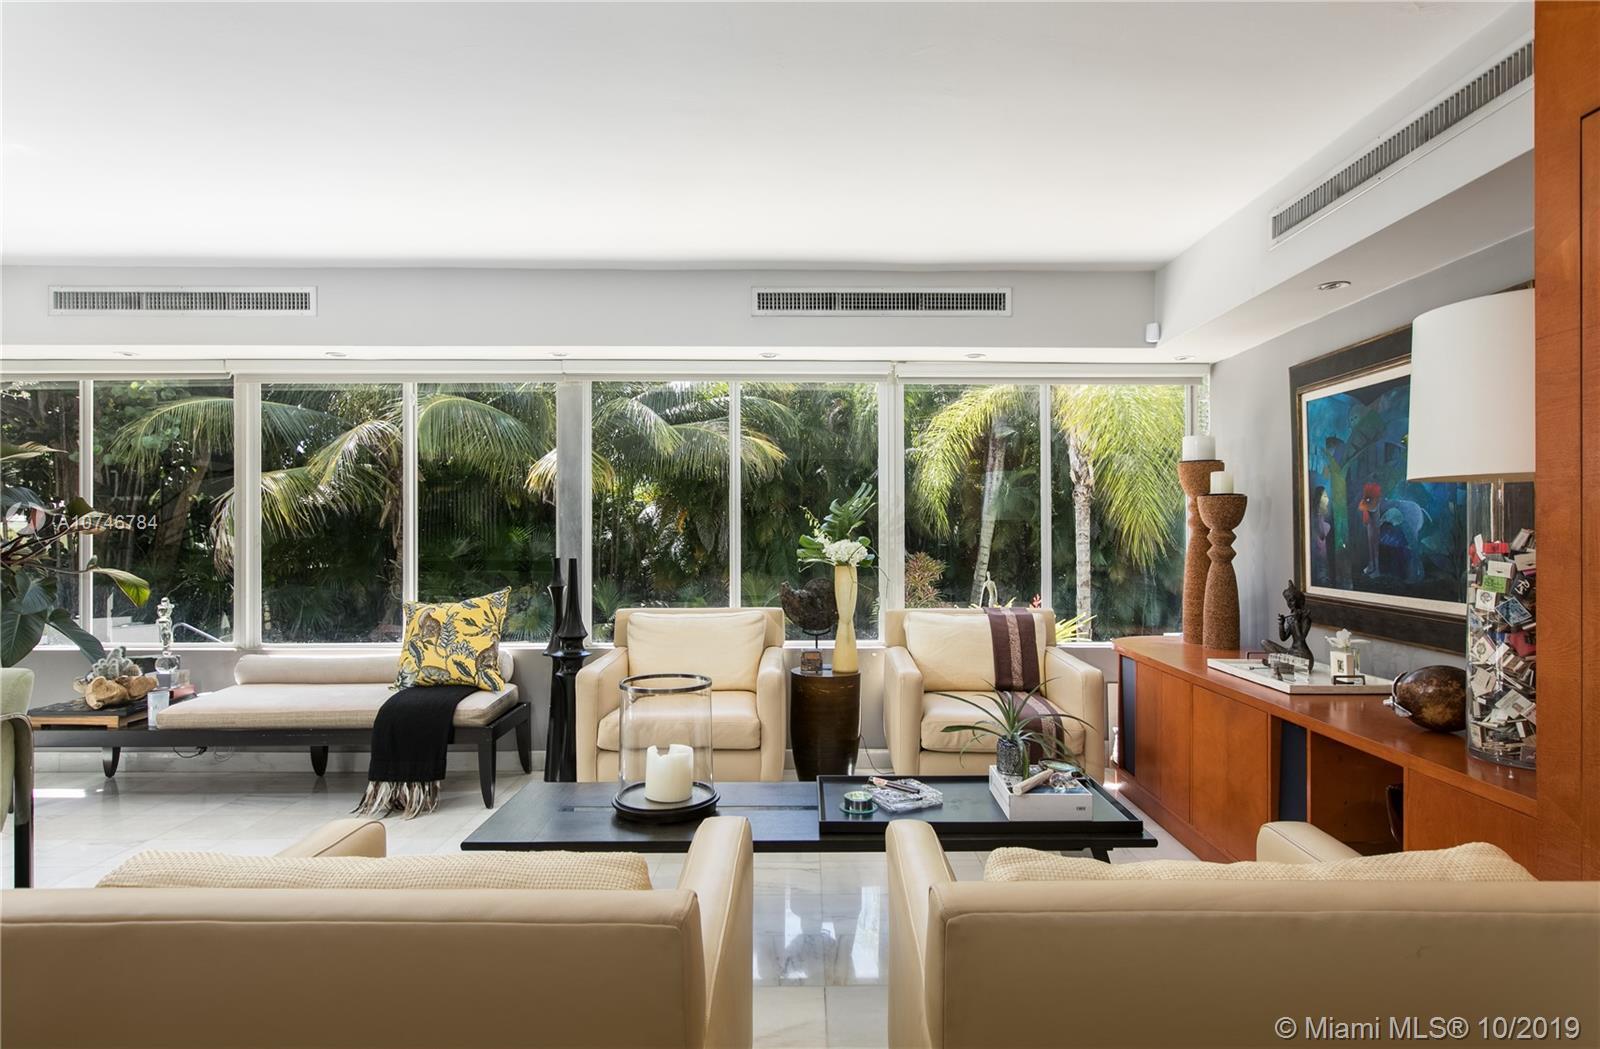 Miami Shores # - 04 - photo